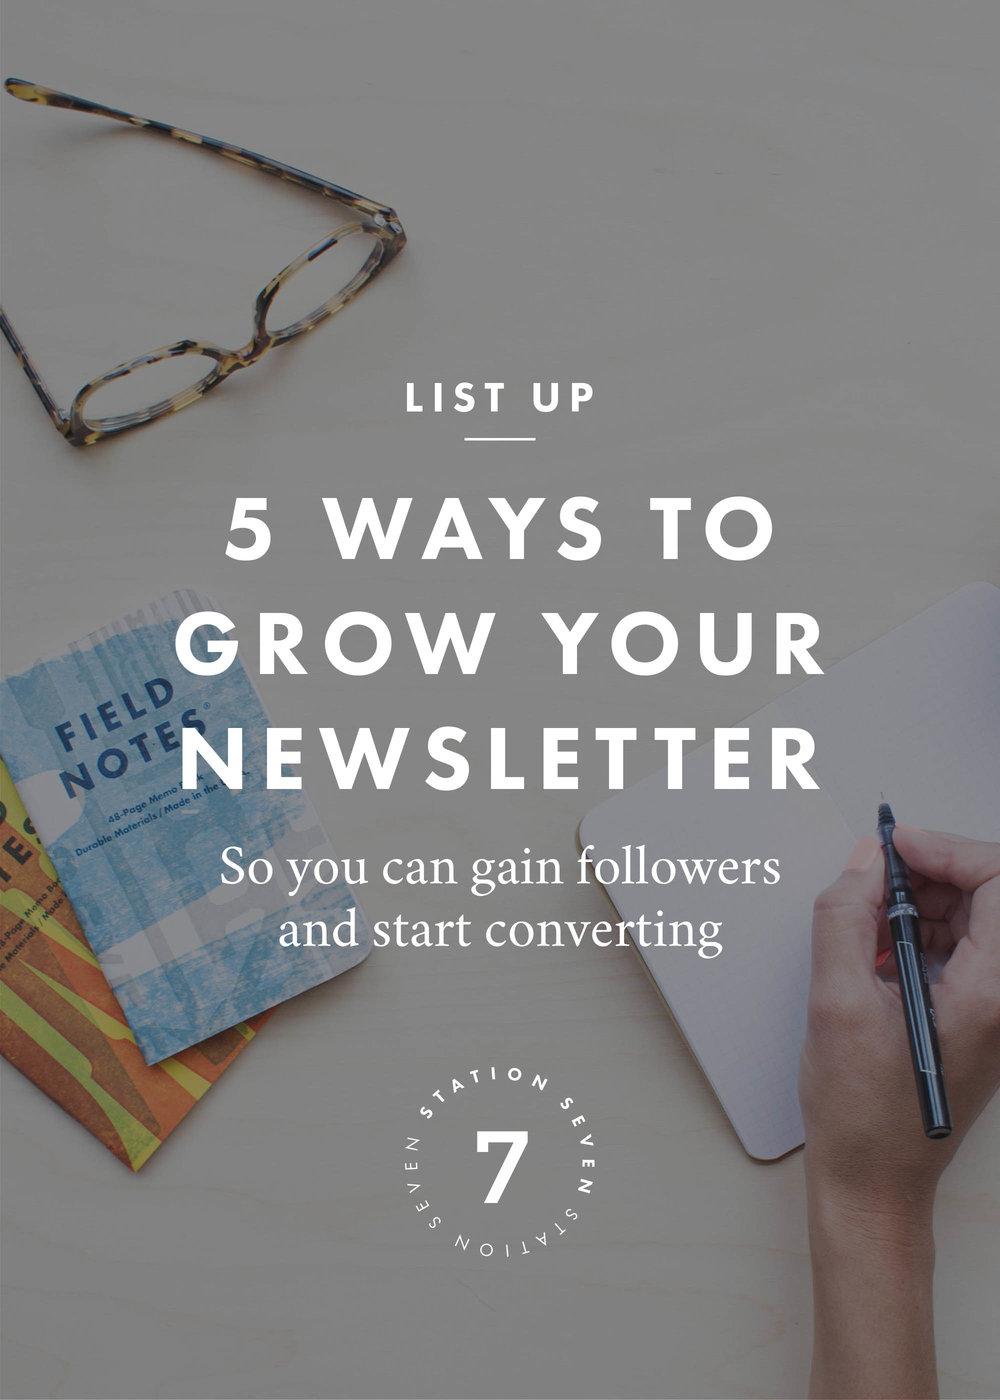 5 Ways to Grow Your Newsletter + Start Converting.jpeg